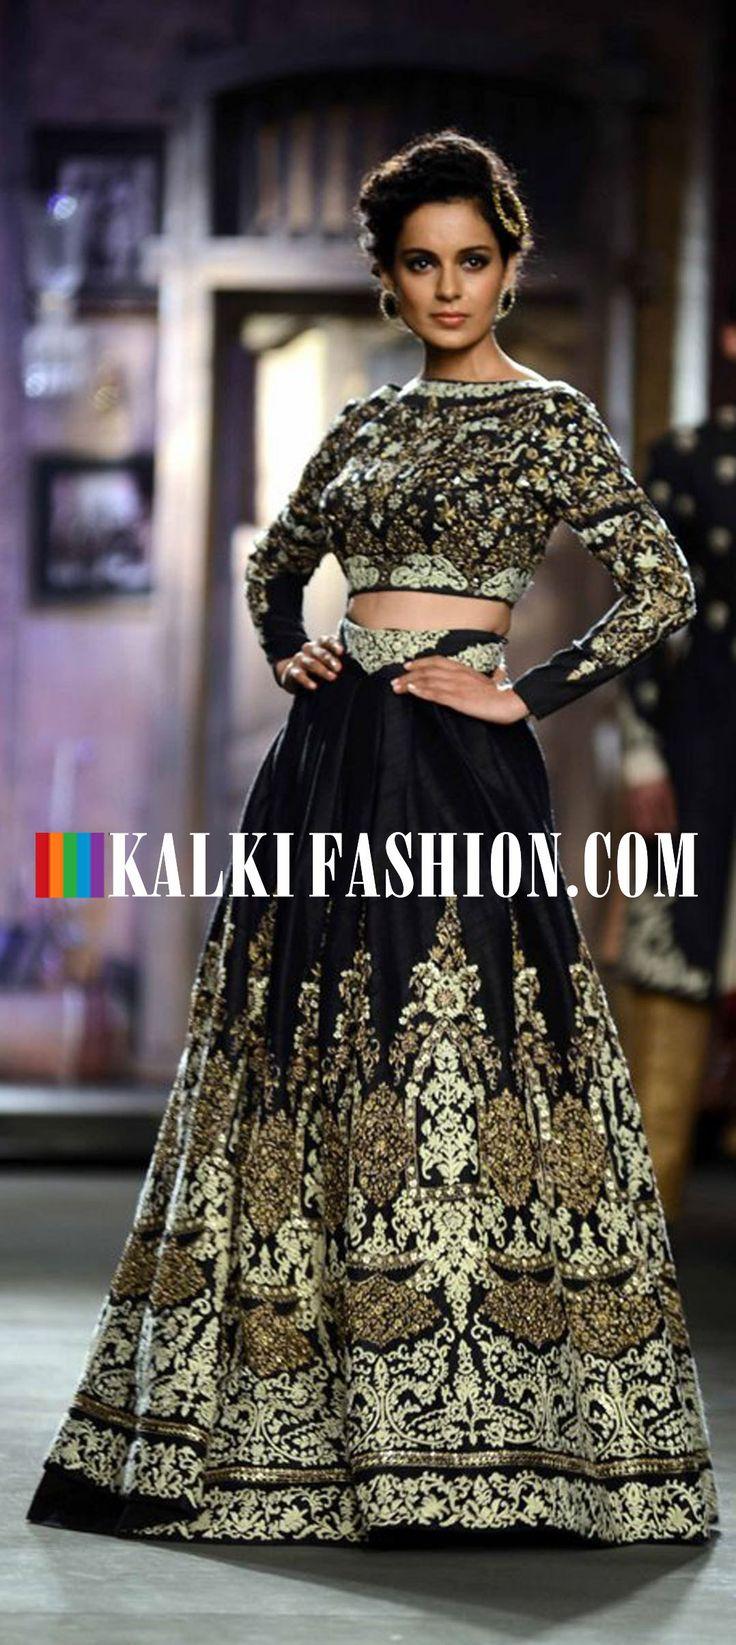 Kangana Ranaut walks the ramp in black embellished gown for Anju Modi at Indian Couture Week. http://www.kalkifashion.com/